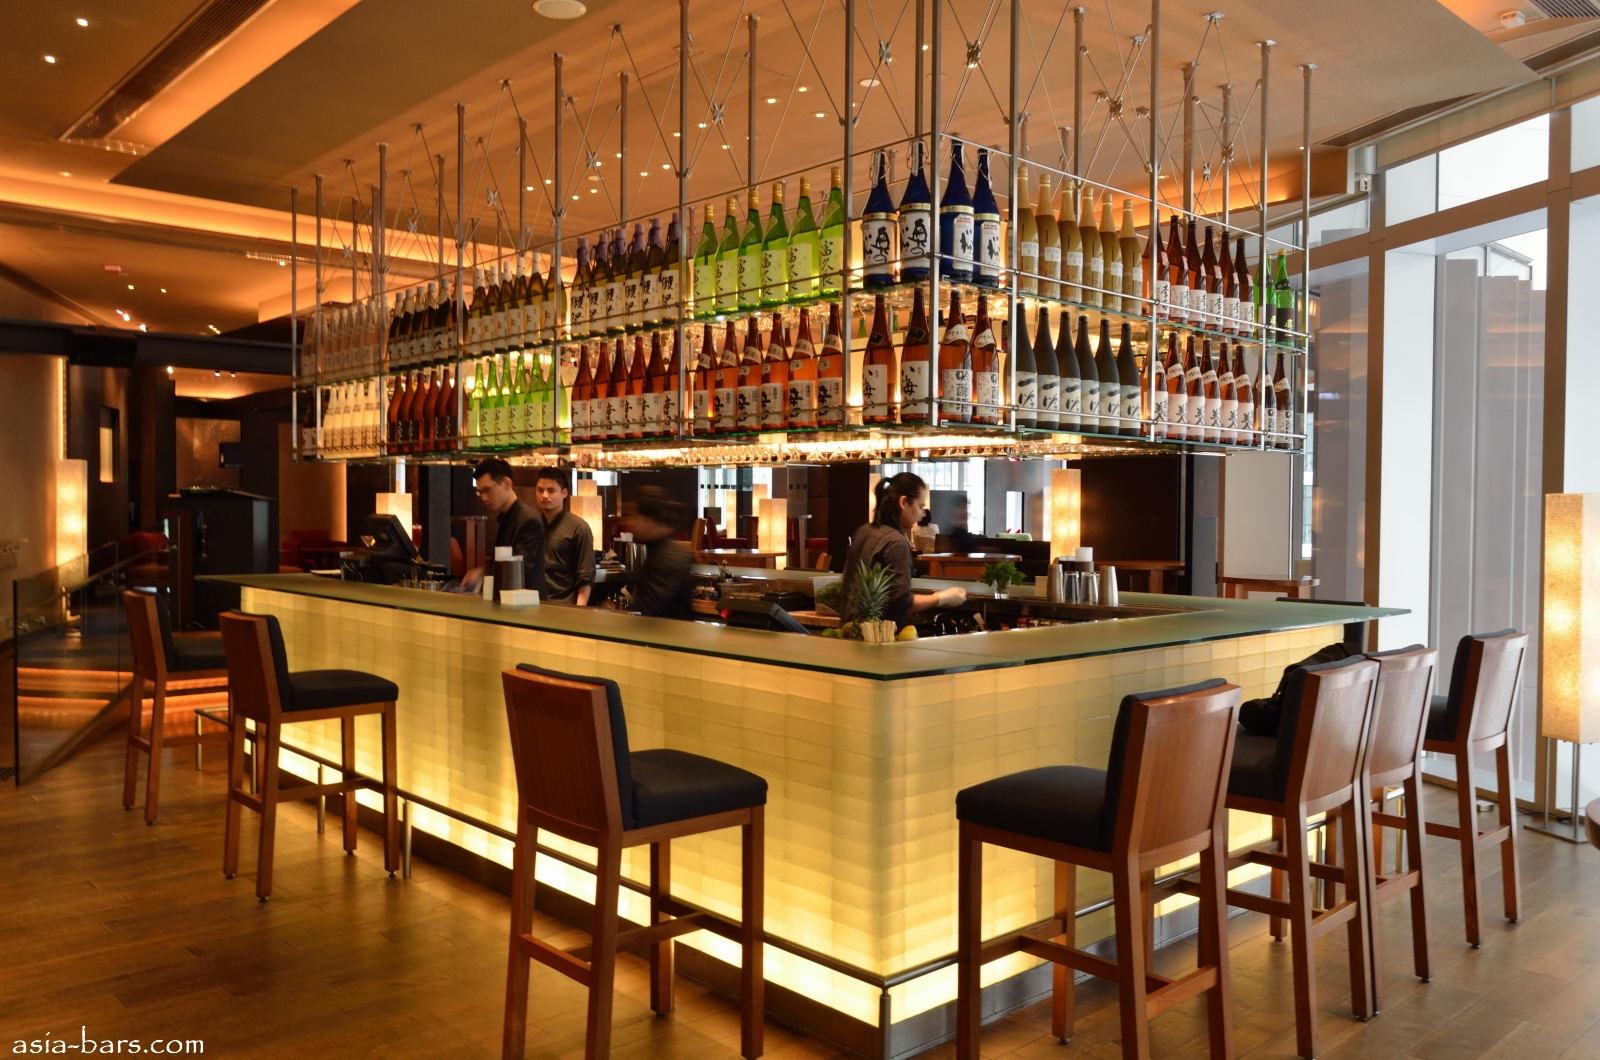 Zuma hong kong introduces zuma around the world top for Cuisine bar design